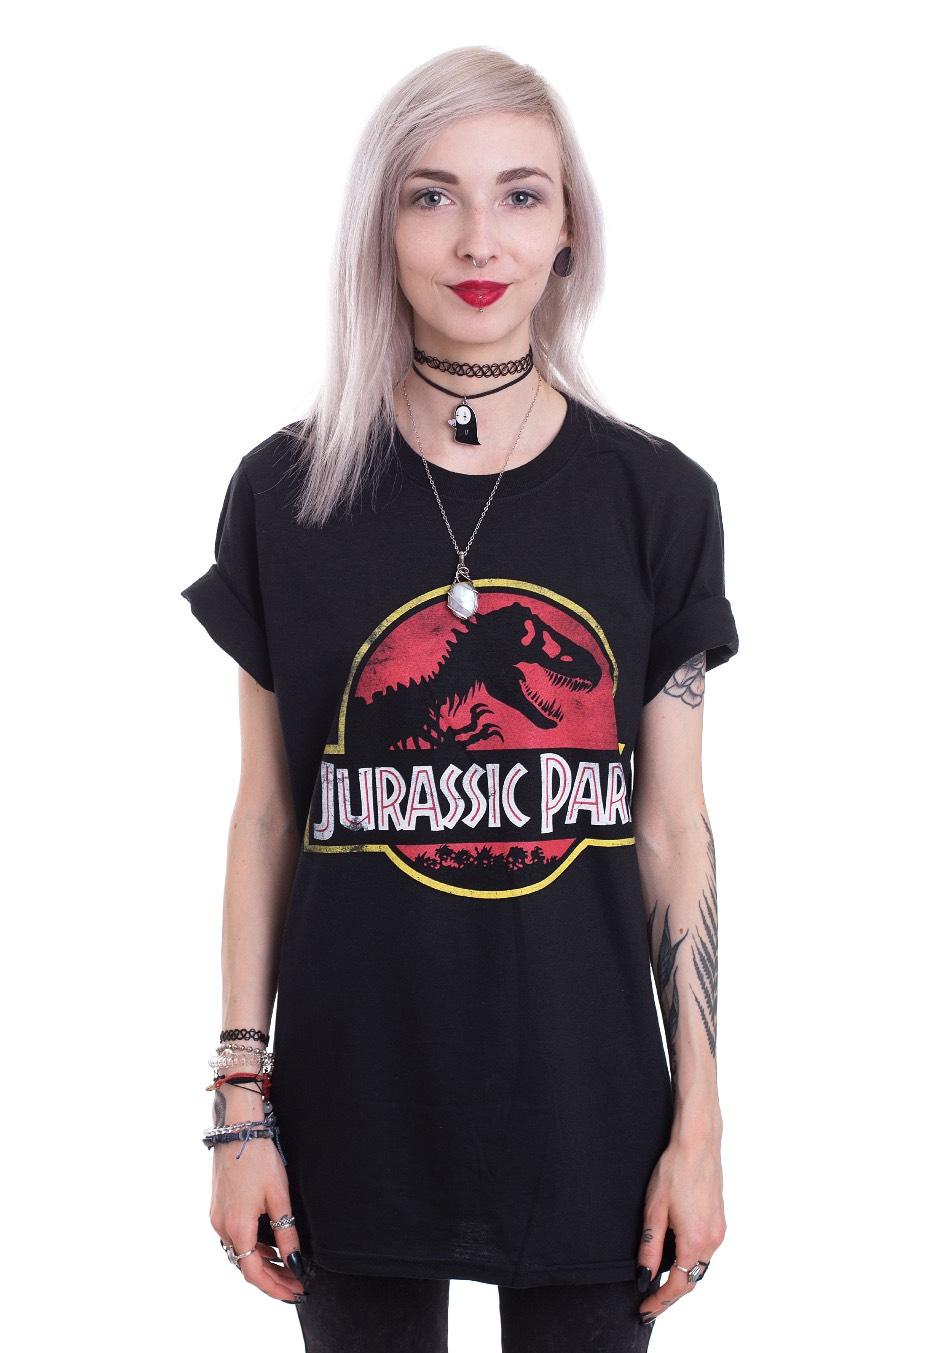 Jurassic Park Logo T Shirt Impericon Com De